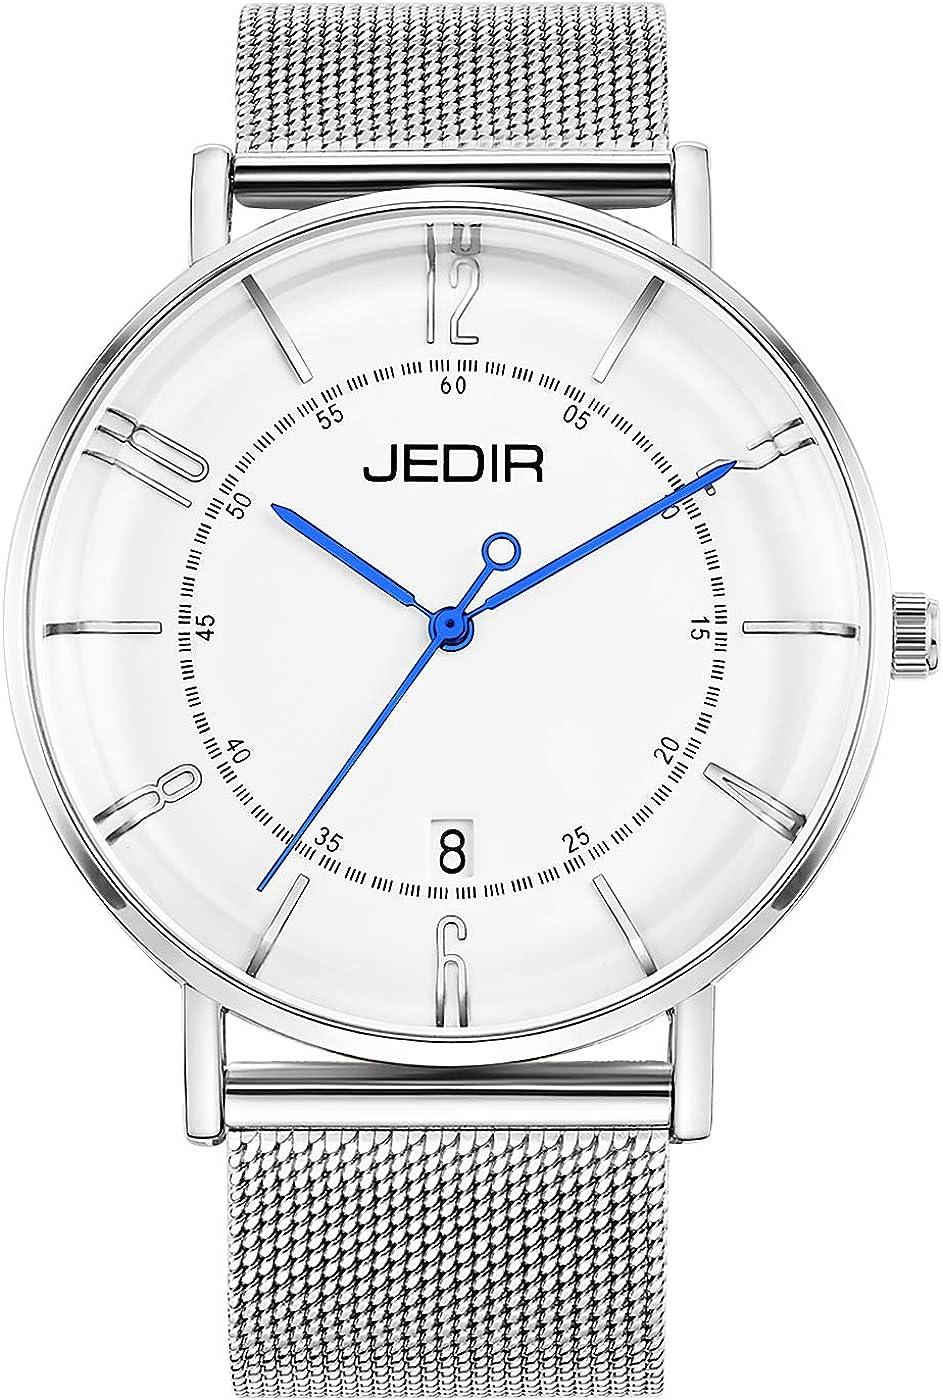 BUREI Men Max 66% OFF Classic Simple Max 80% OFF Slim Quartz Wrist Watch Calend Big Dial